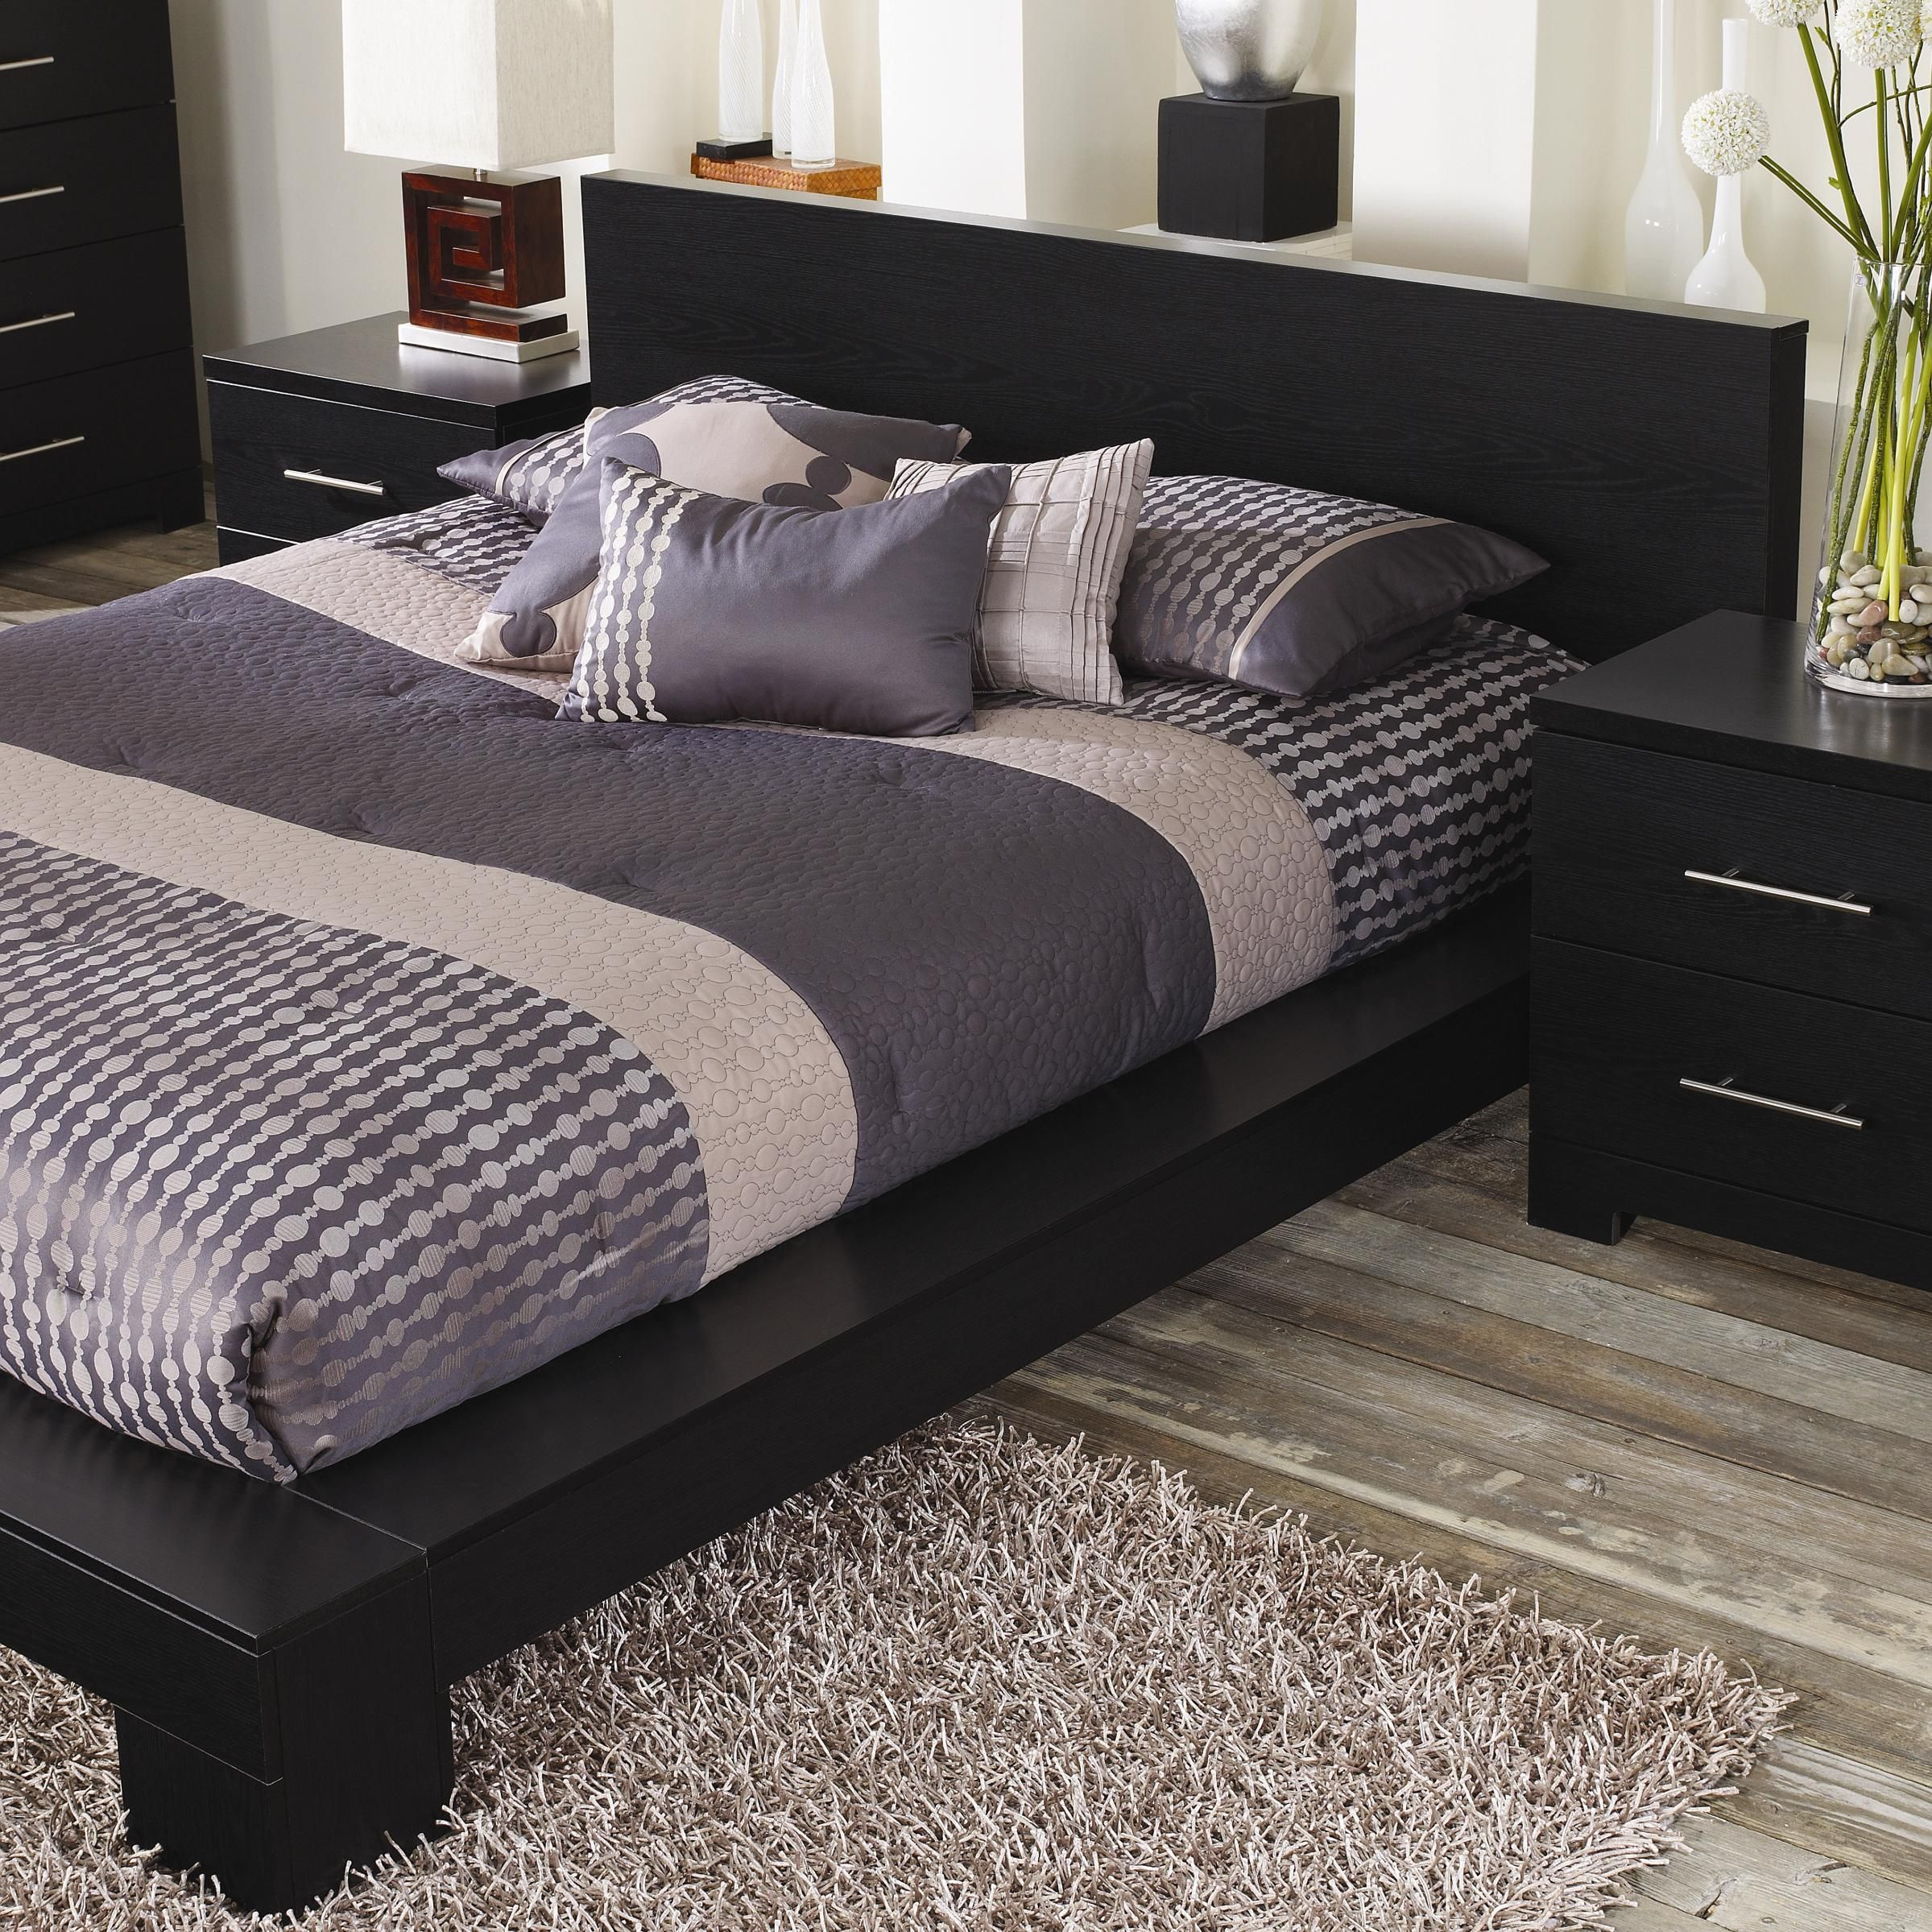 Lang Furniture Brooklyn Cinder Oak Loft Platform Bed - Low profile  available in Full, Queen